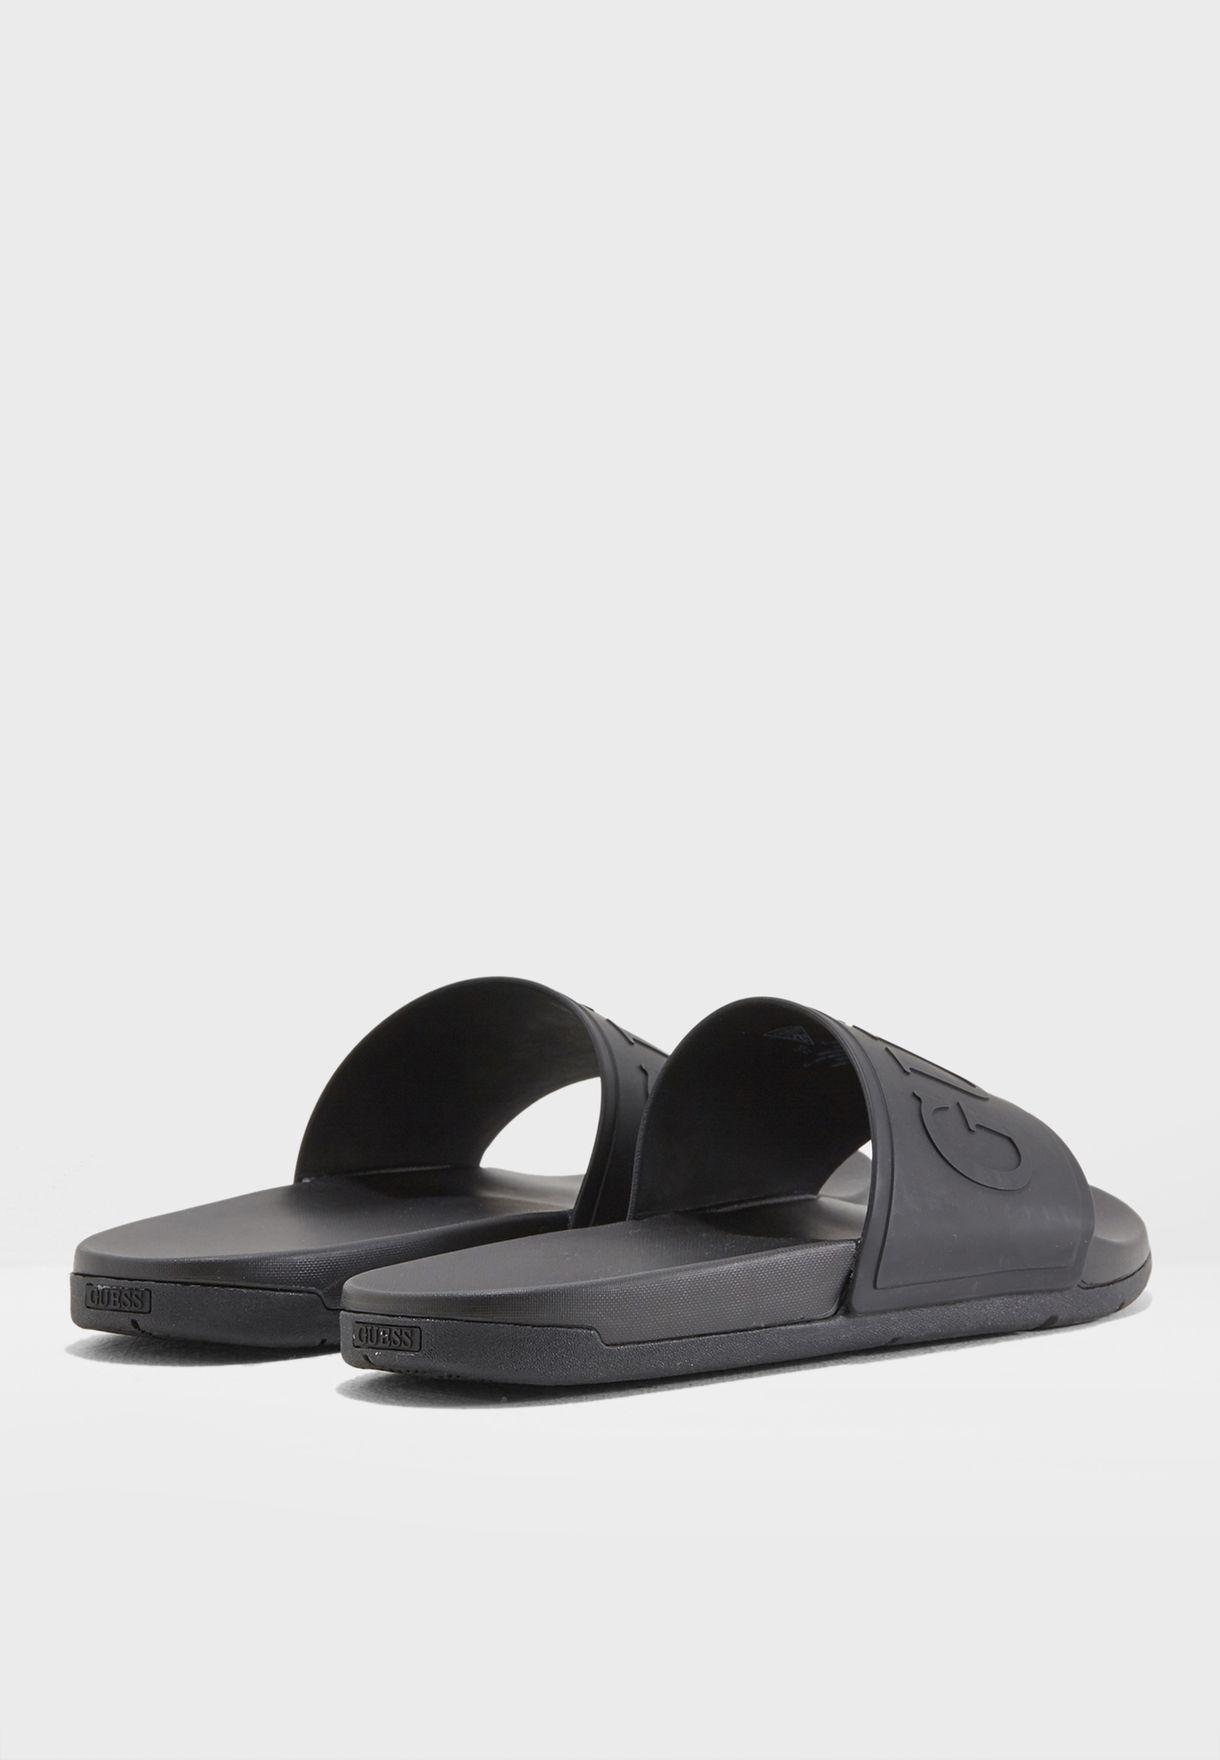 bad92e6c7f95 Shop Guess black Delfino Slipons gmDELFINO for Men in Bahrain ...